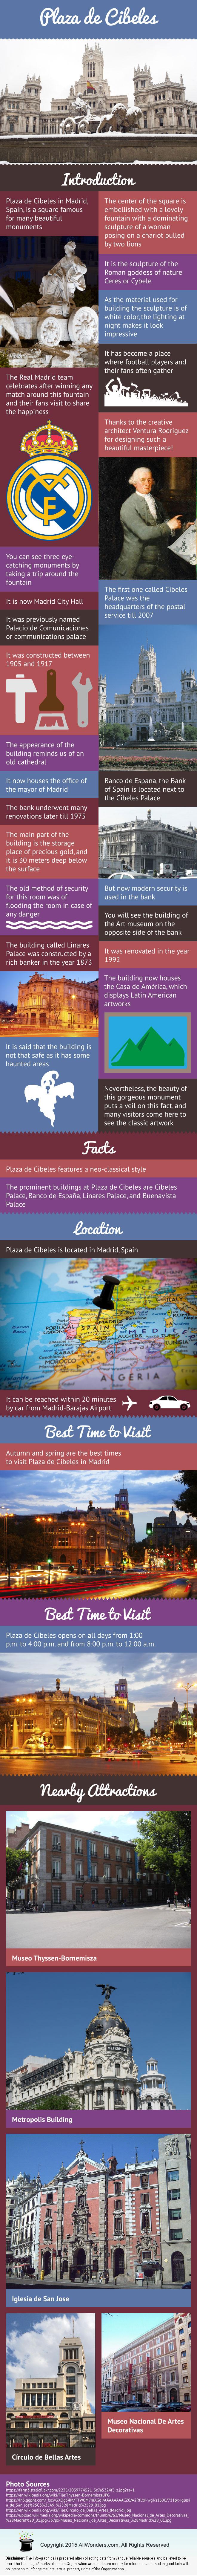 Plaza de Cibeles Infographic